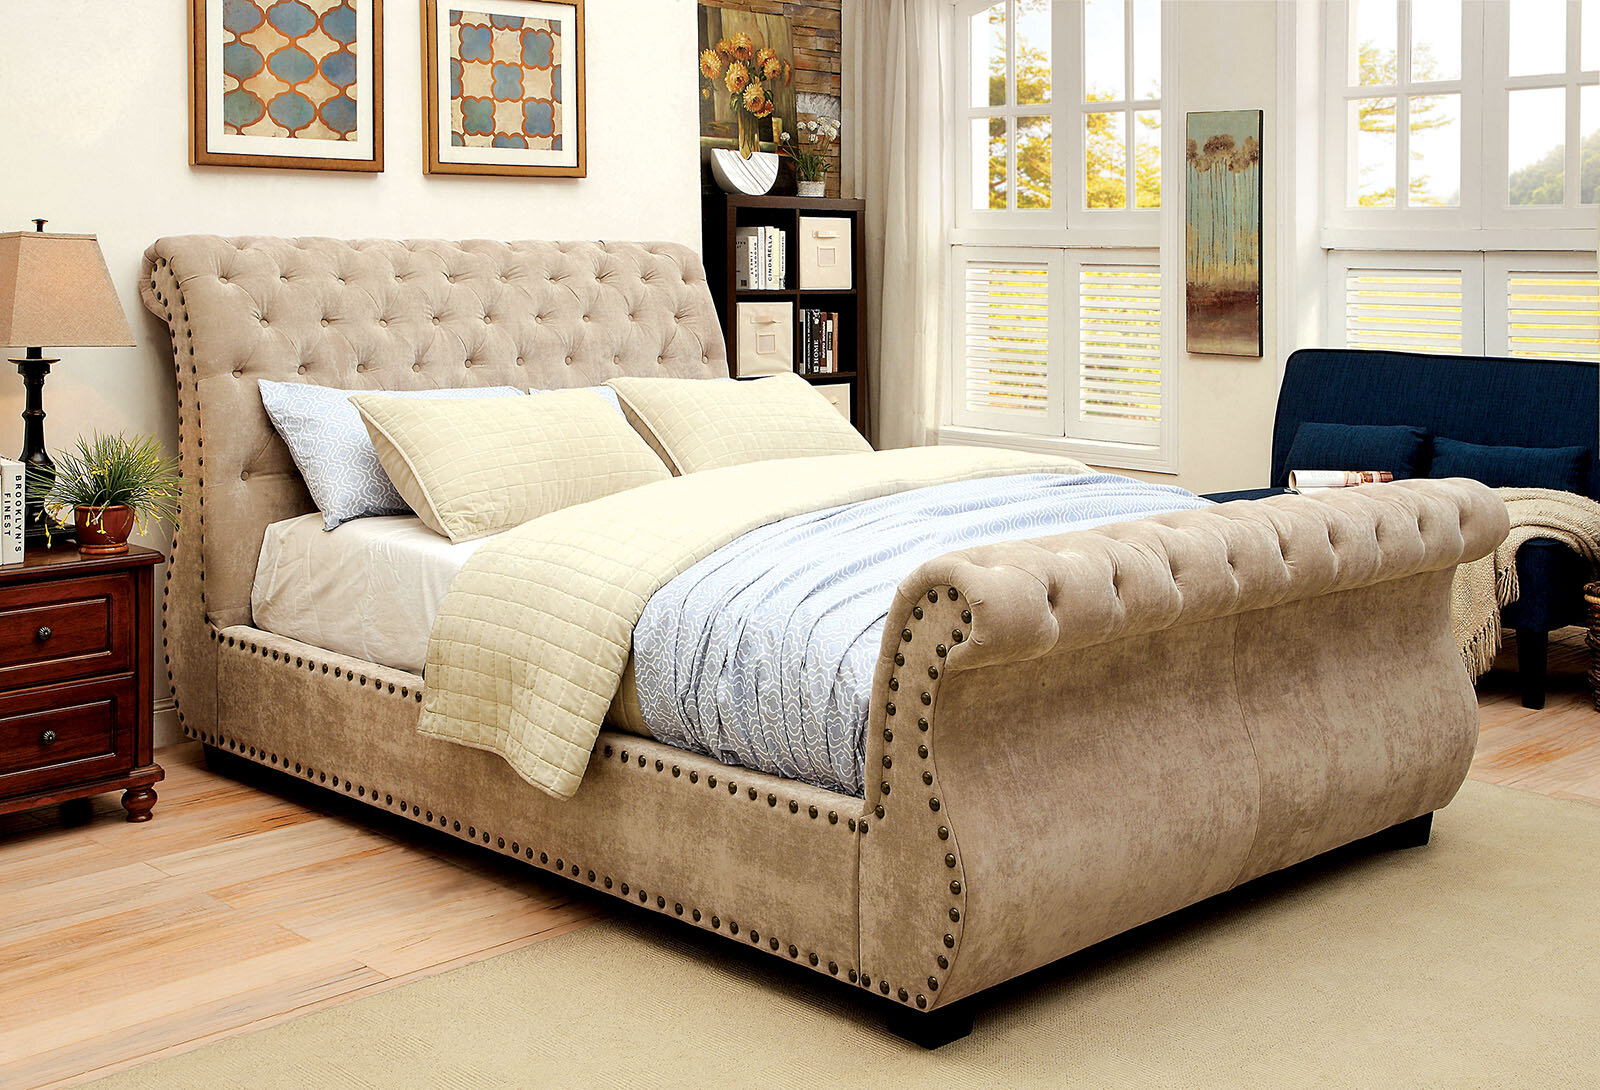 Upholstered sleigh bed frame Queen Wayfair Darby Home Co Gayla Upholstered Sleigh Bed Reviews Wayfair